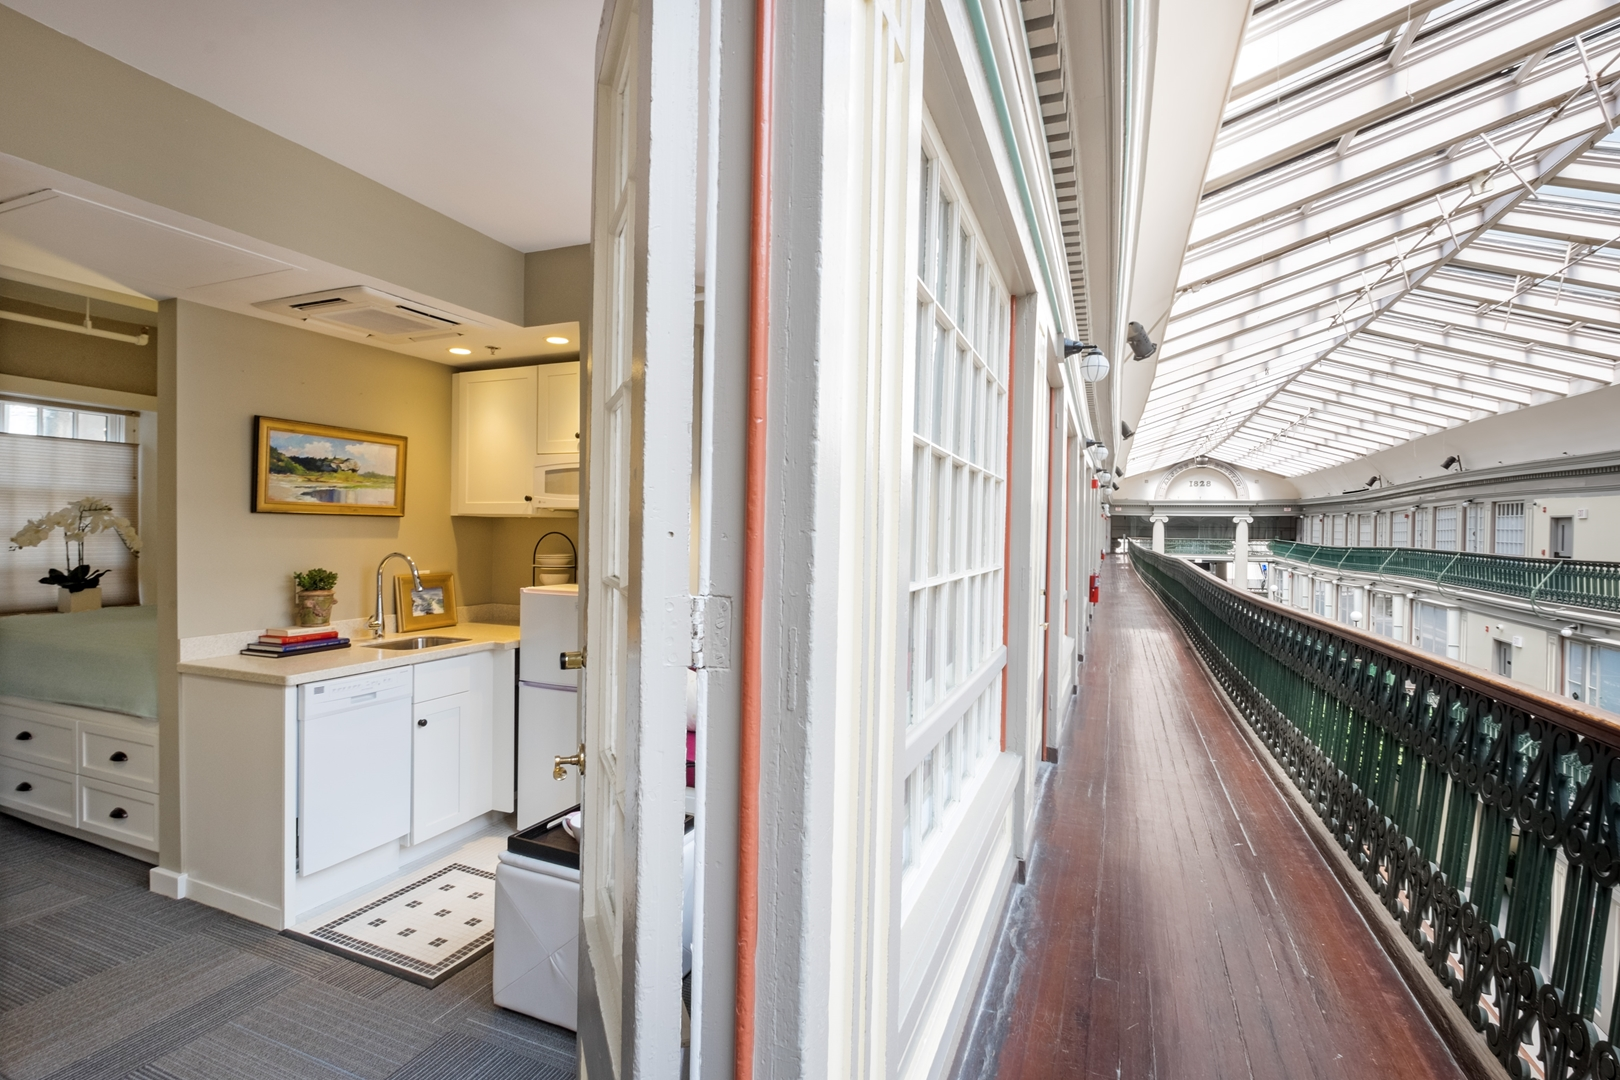 The Micro Lofts at The Arcade Providence Loft Interior and Atrium Photo Credit Ben Jacobsen (Copy)